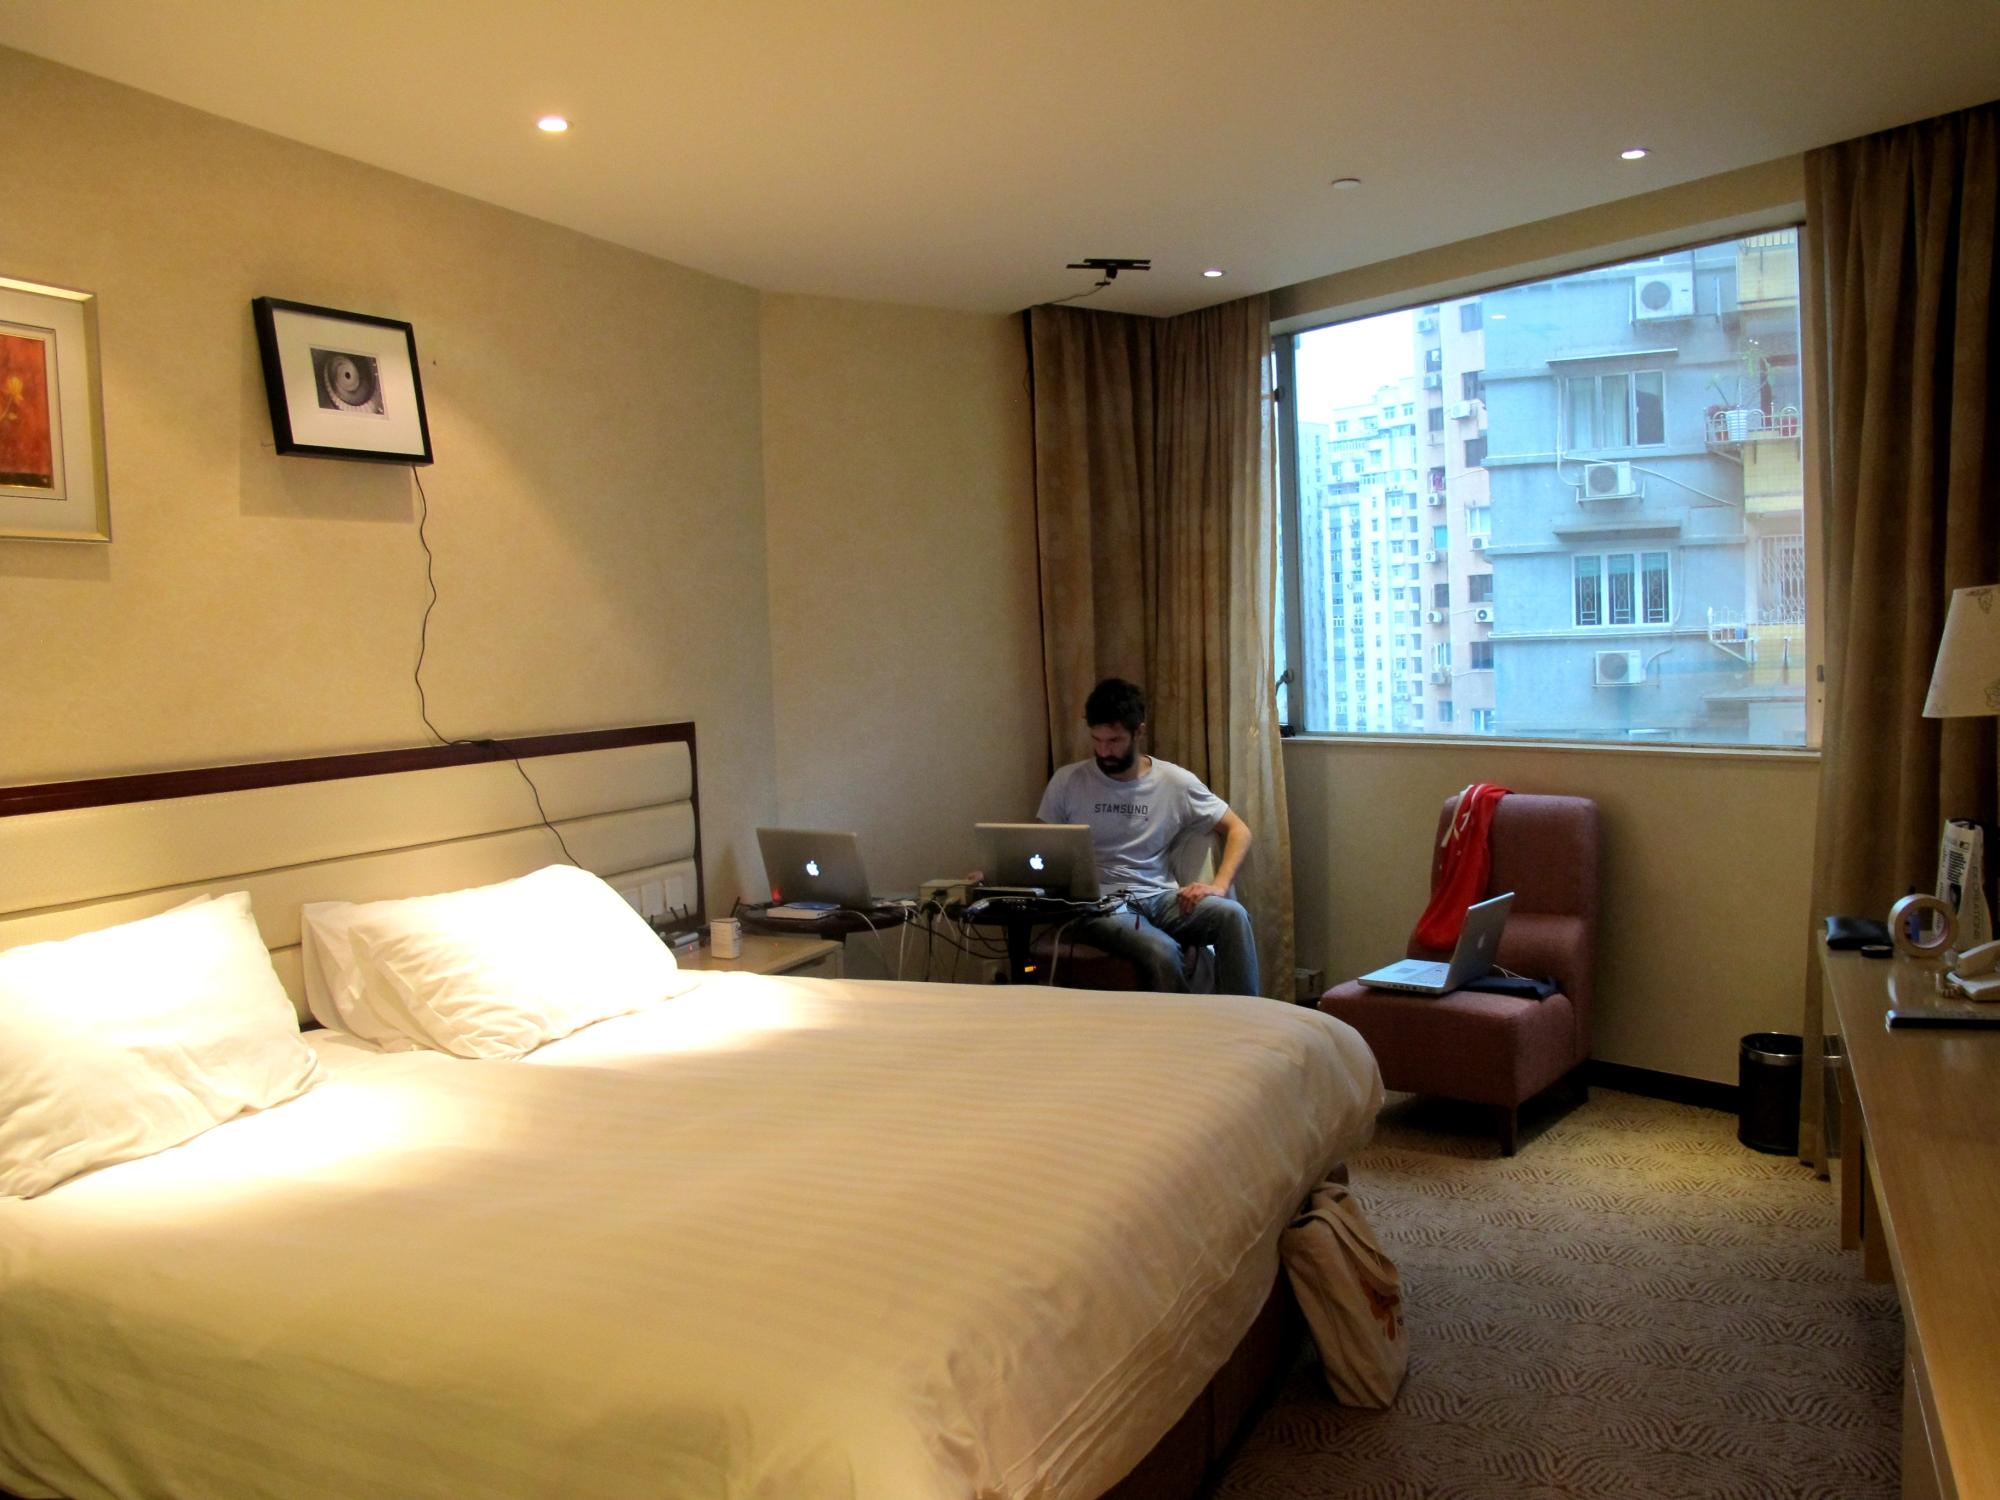 Field Works Hotel - Macau2